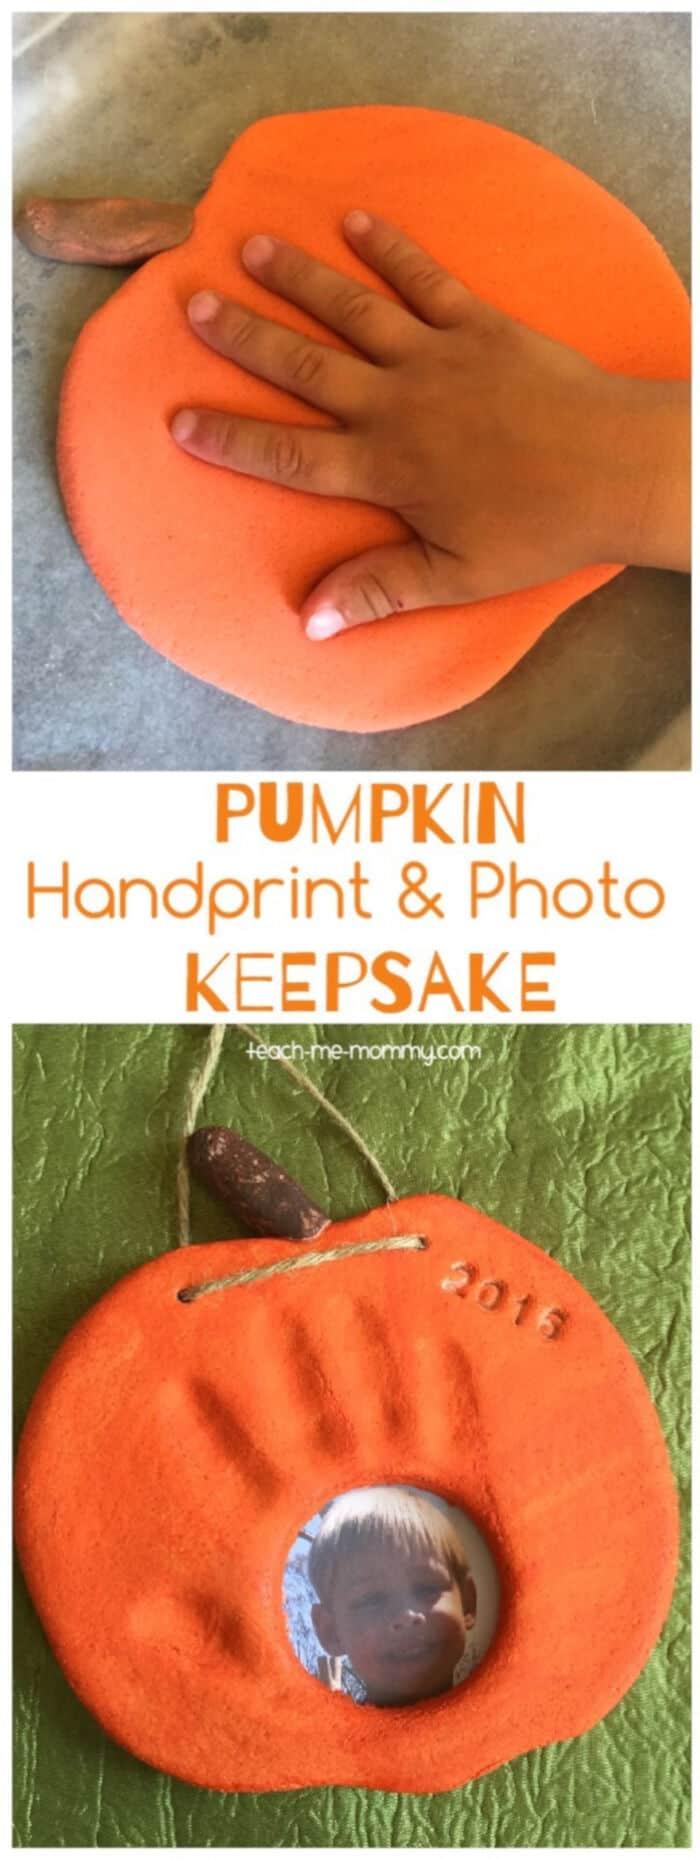 Pumpkin Handprint & Photo Keepsake by Teach Me Mommy